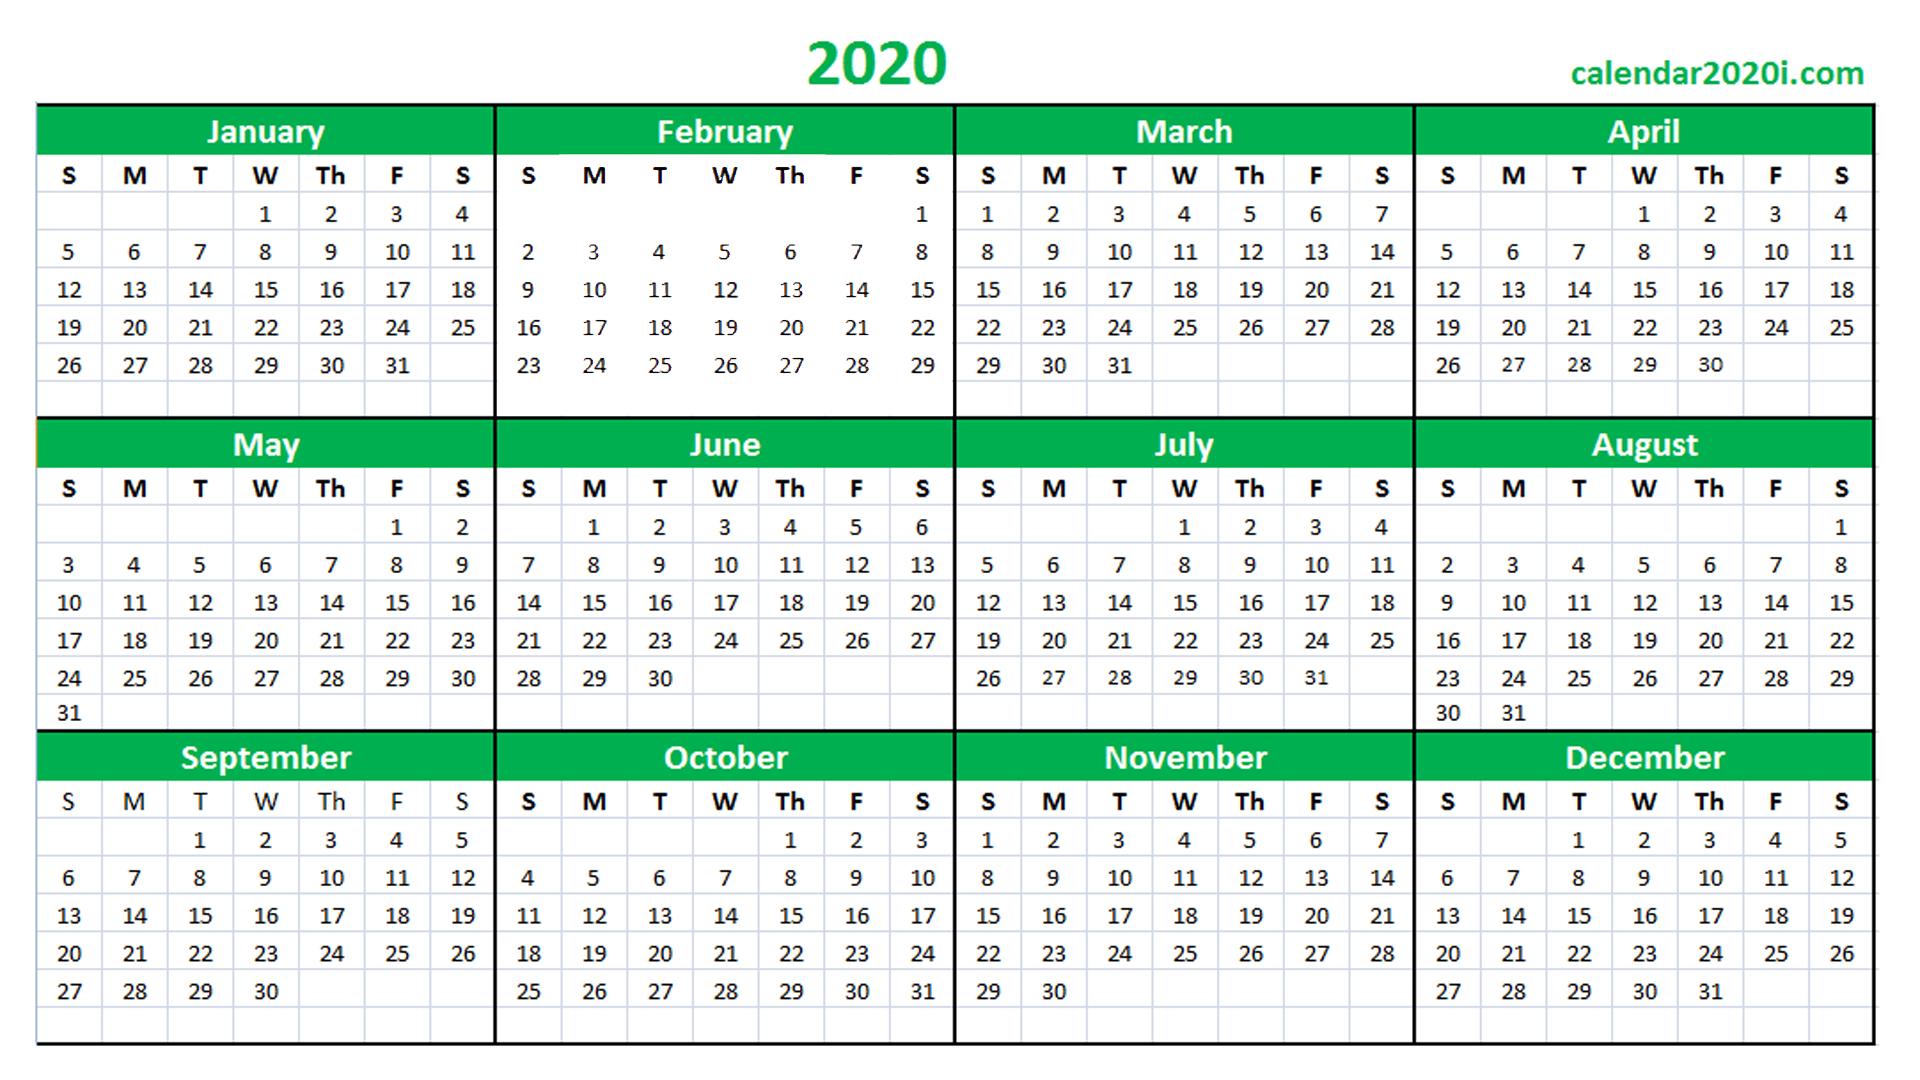 Blank 2020 Calendar Printable Templates | Calendar 2020 pertaining to 2020 Excel Calendar